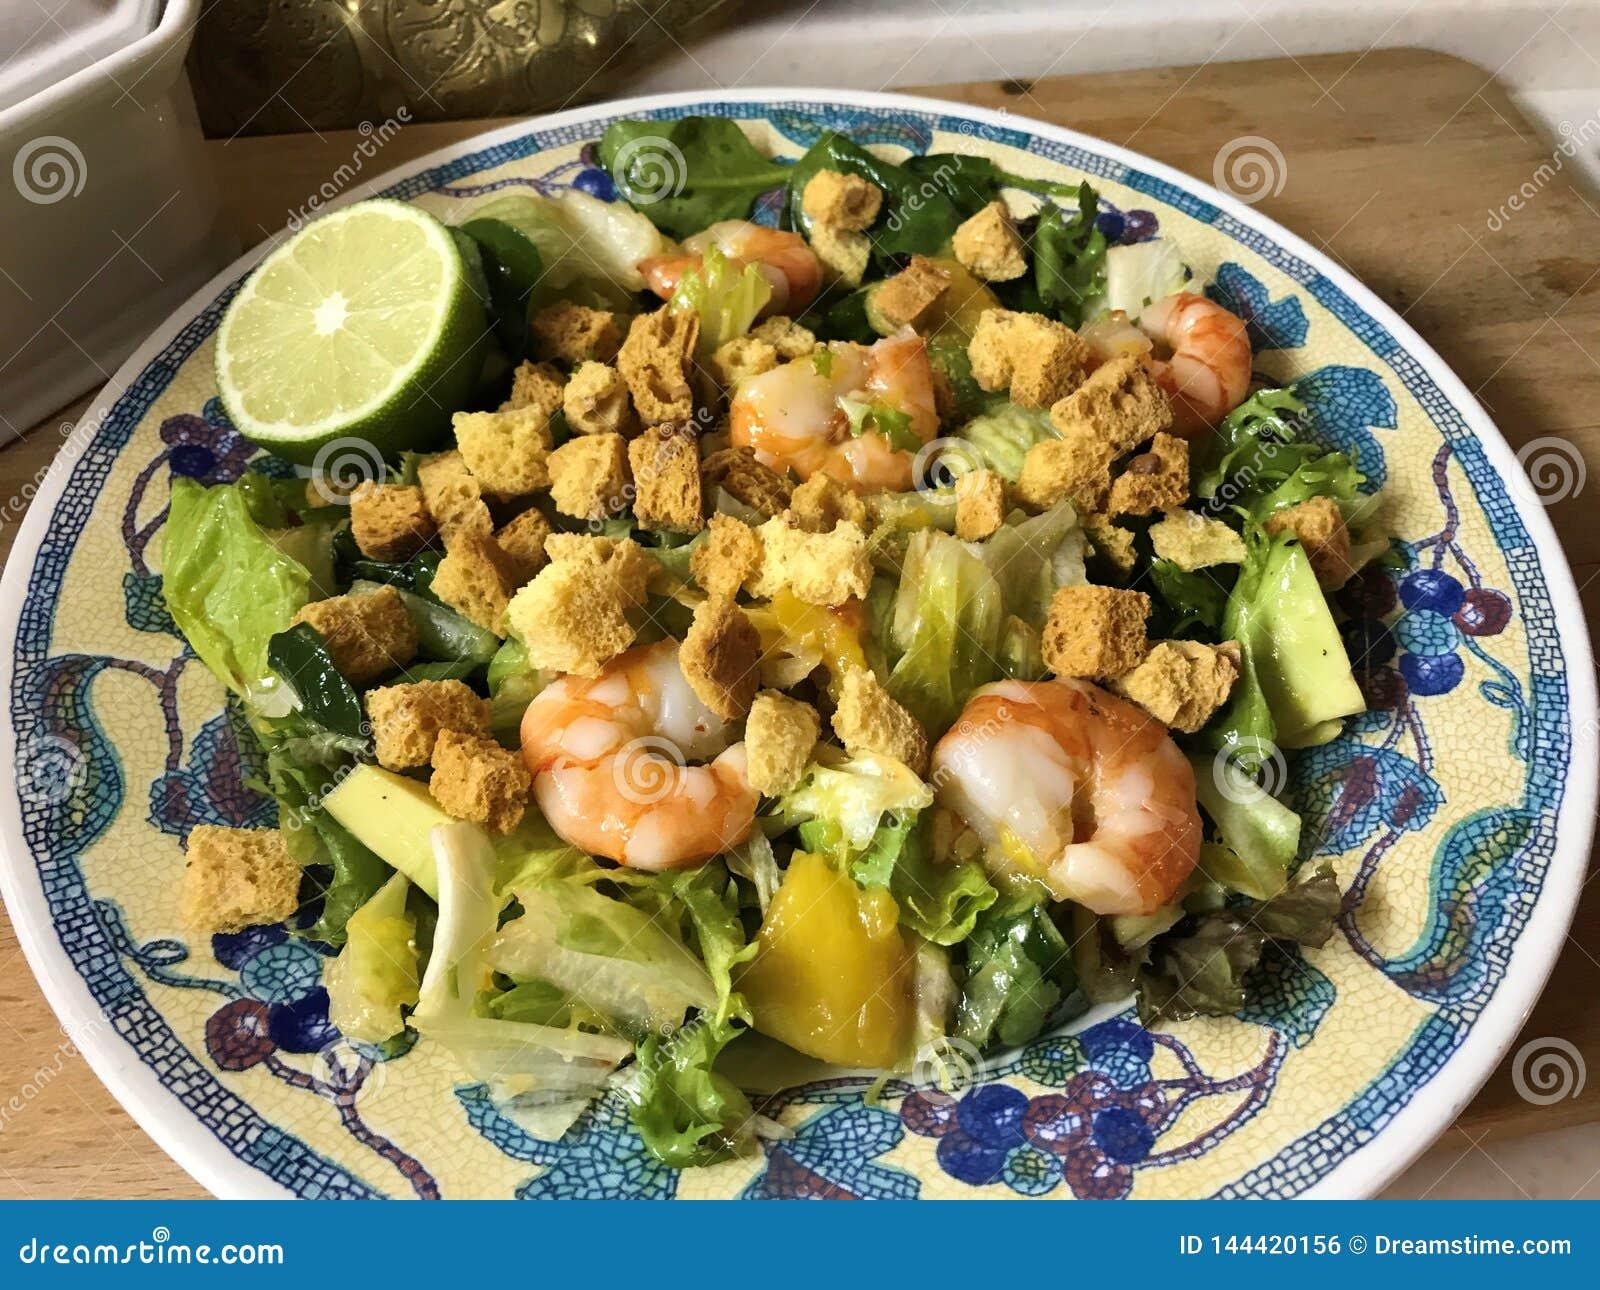 Salad with tiger prawns, mango, avocado and sweet chili.